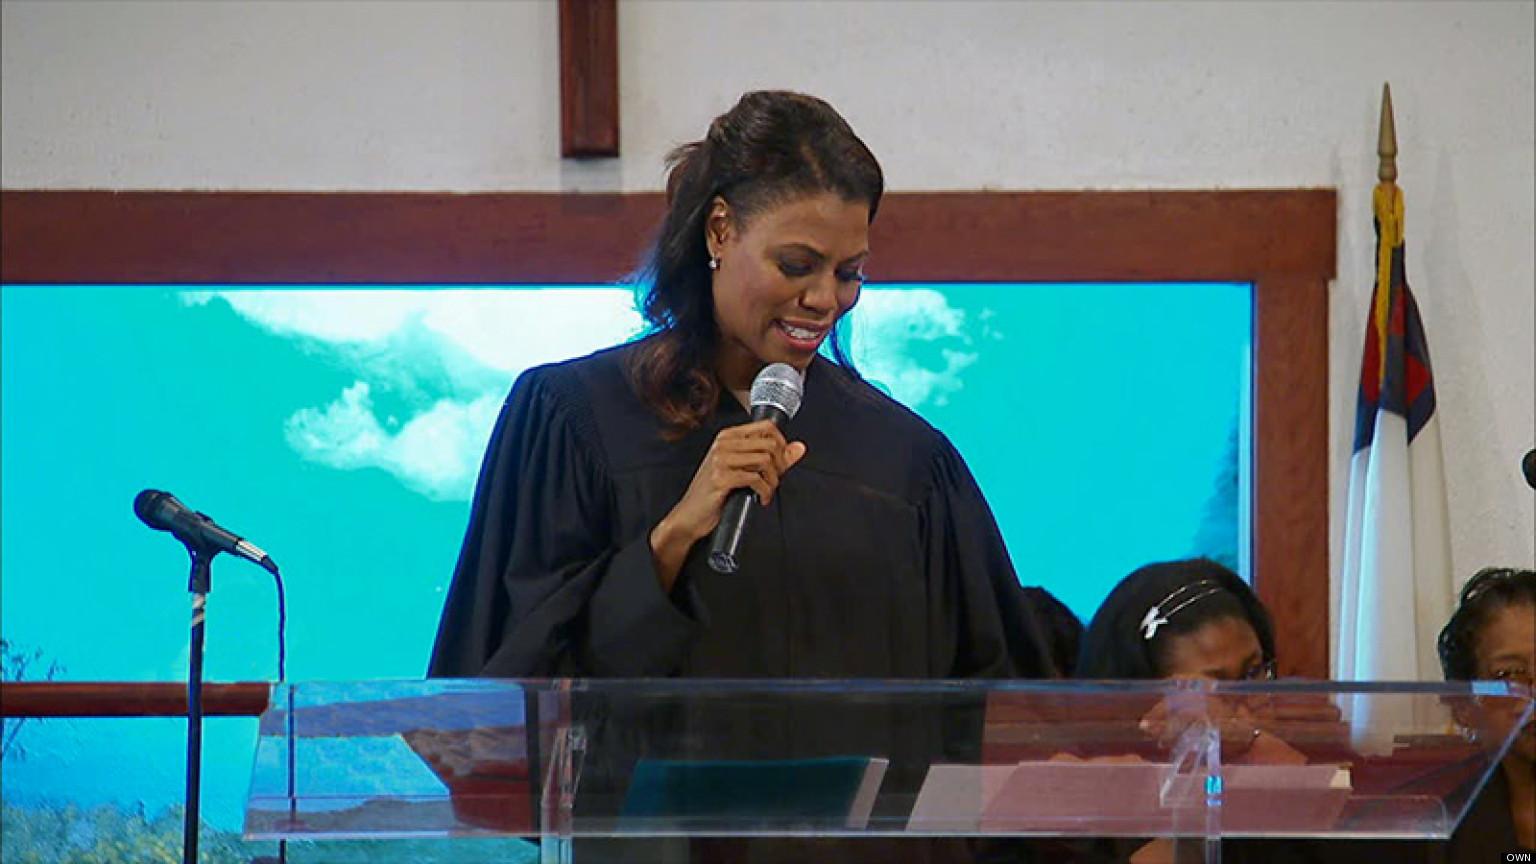 Black Pastors Preaching Clip Art - newhairstylesformen2014.com